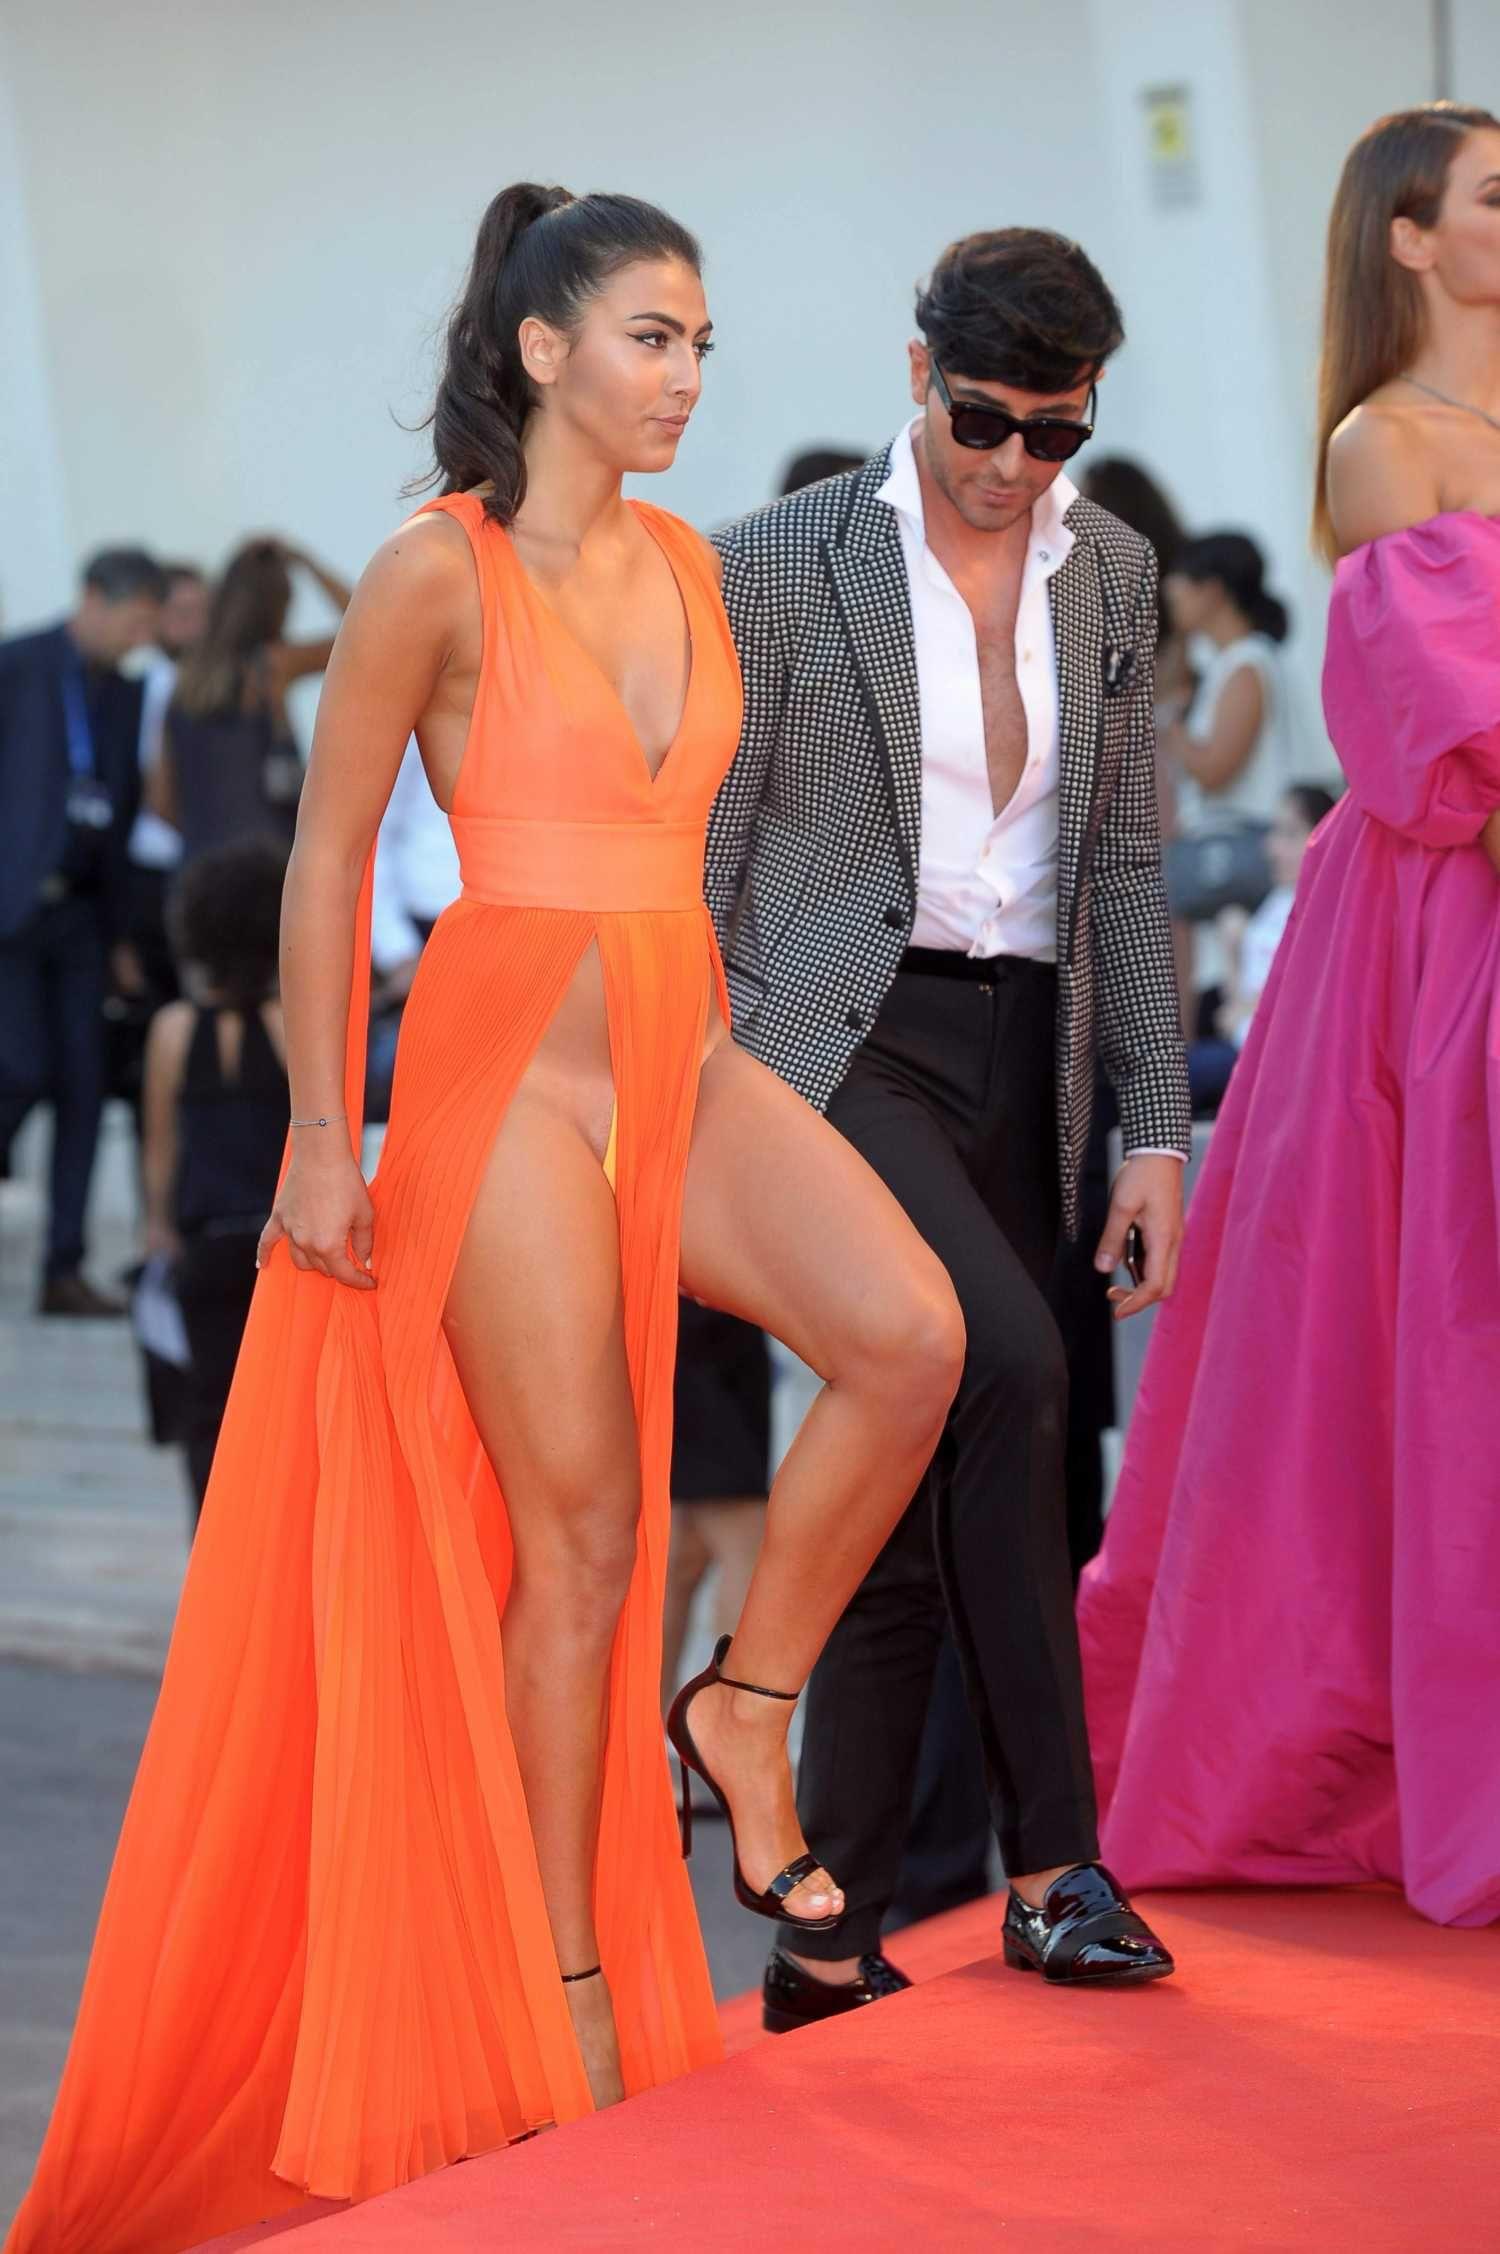 fancy dress upskirt Giulia-Salemi-Upskirt-at-Brimstone-Premiere-9.jpg (